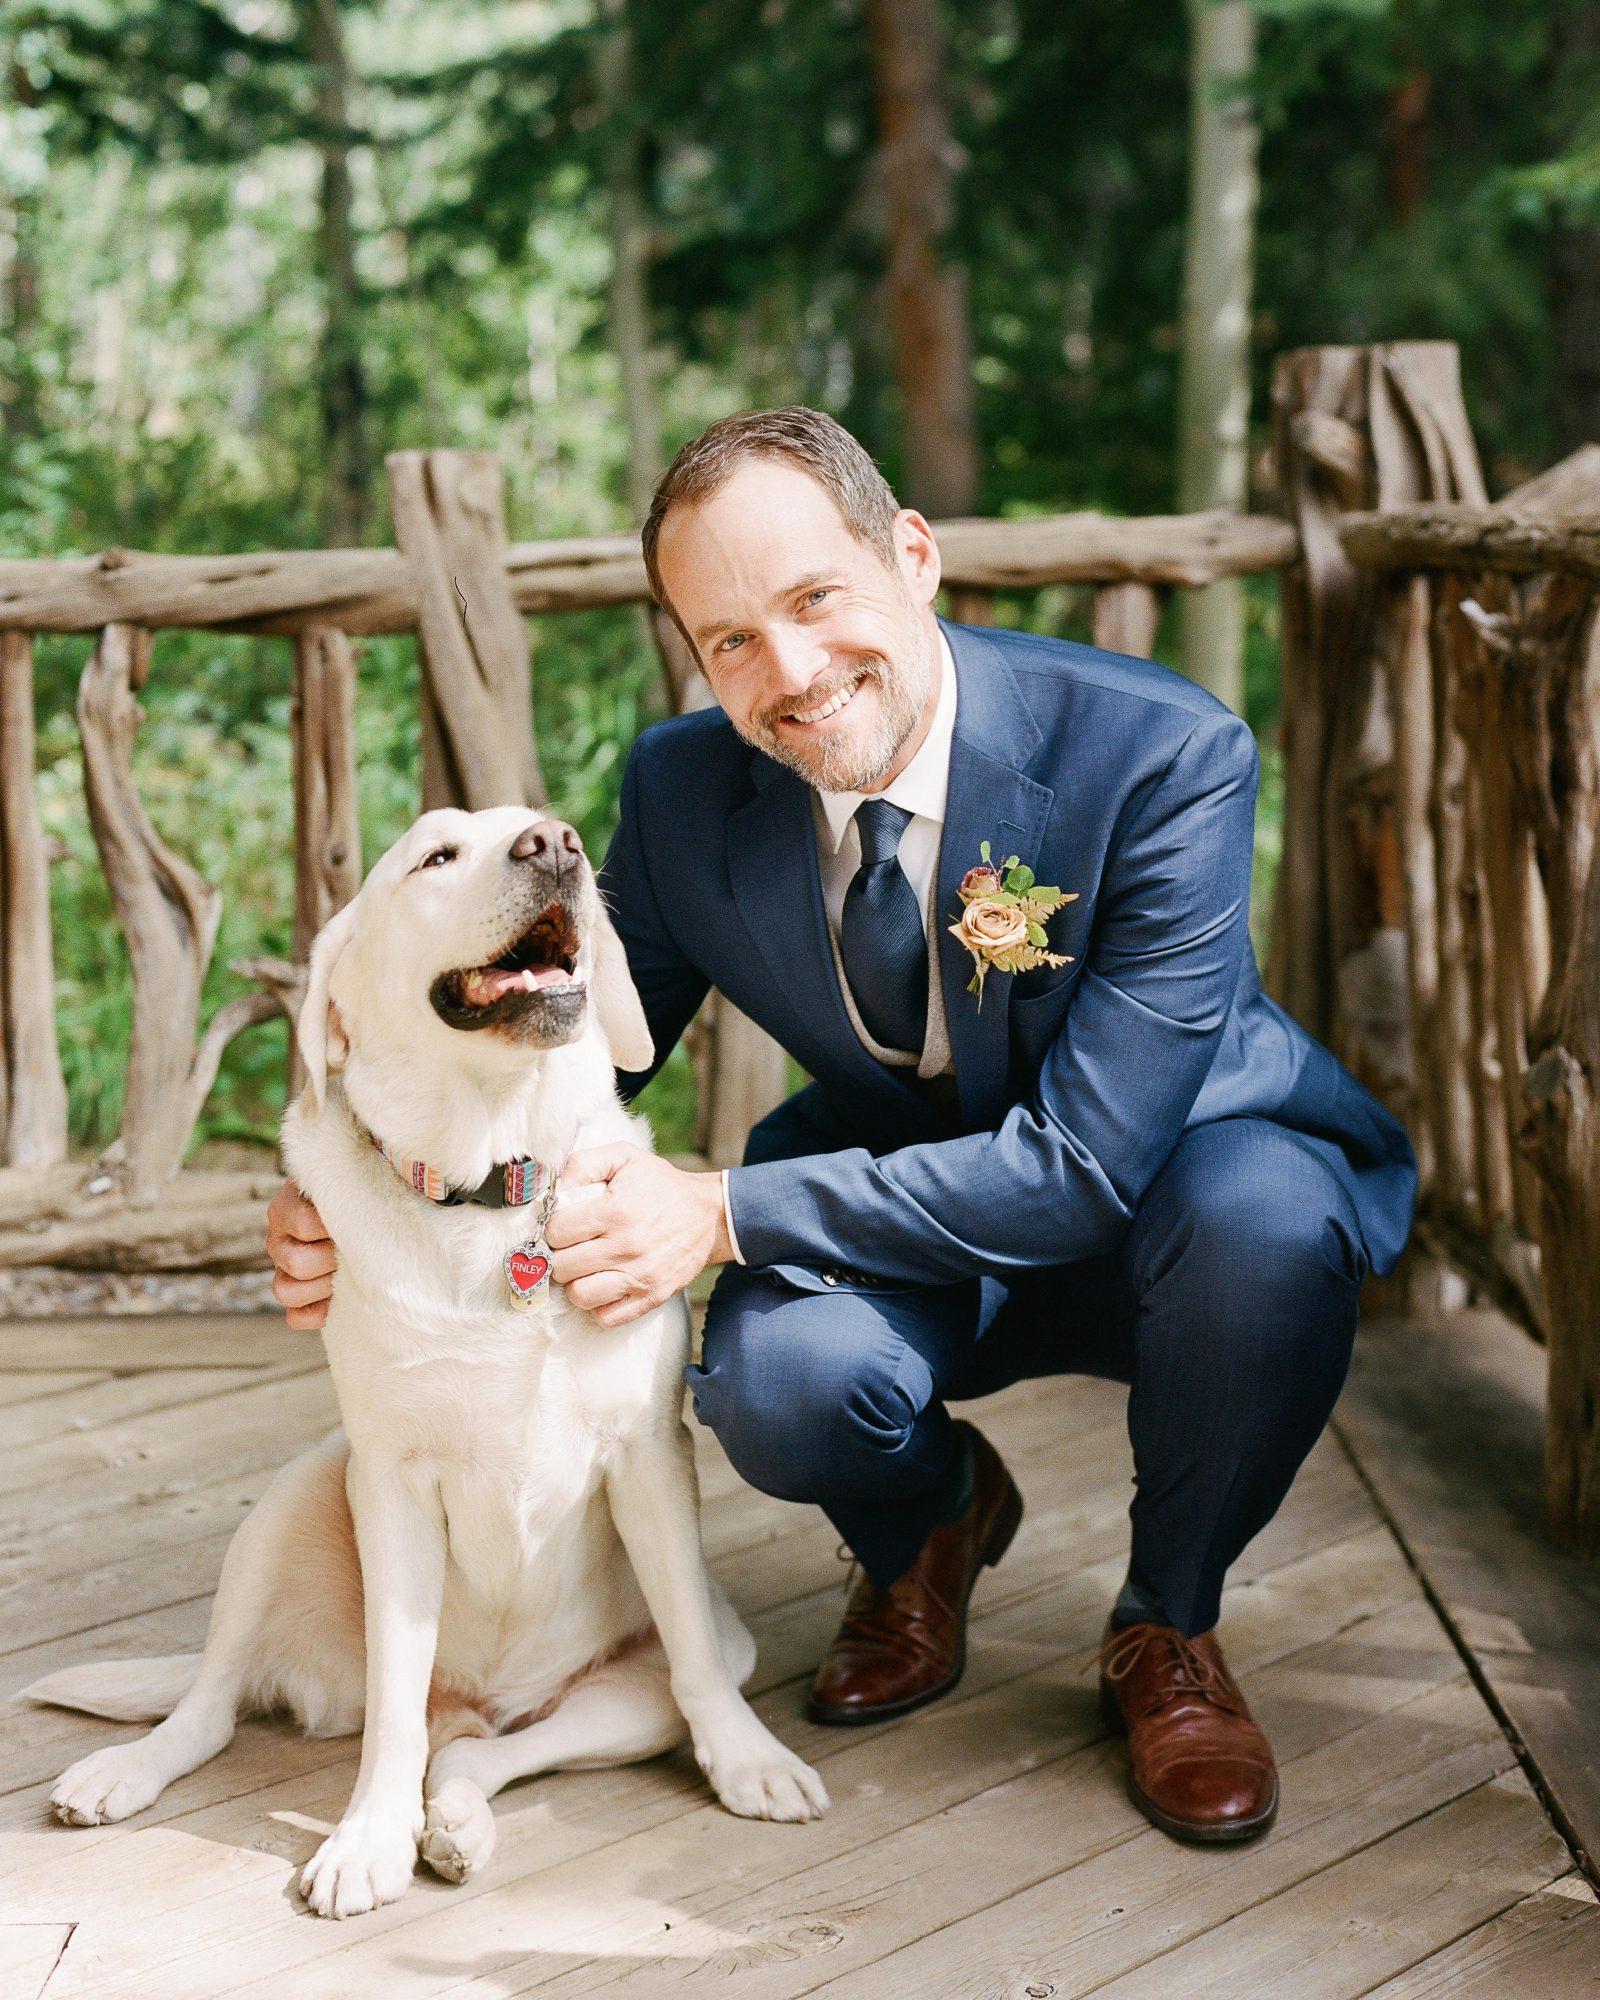 jill phil wedding groom posing with dog